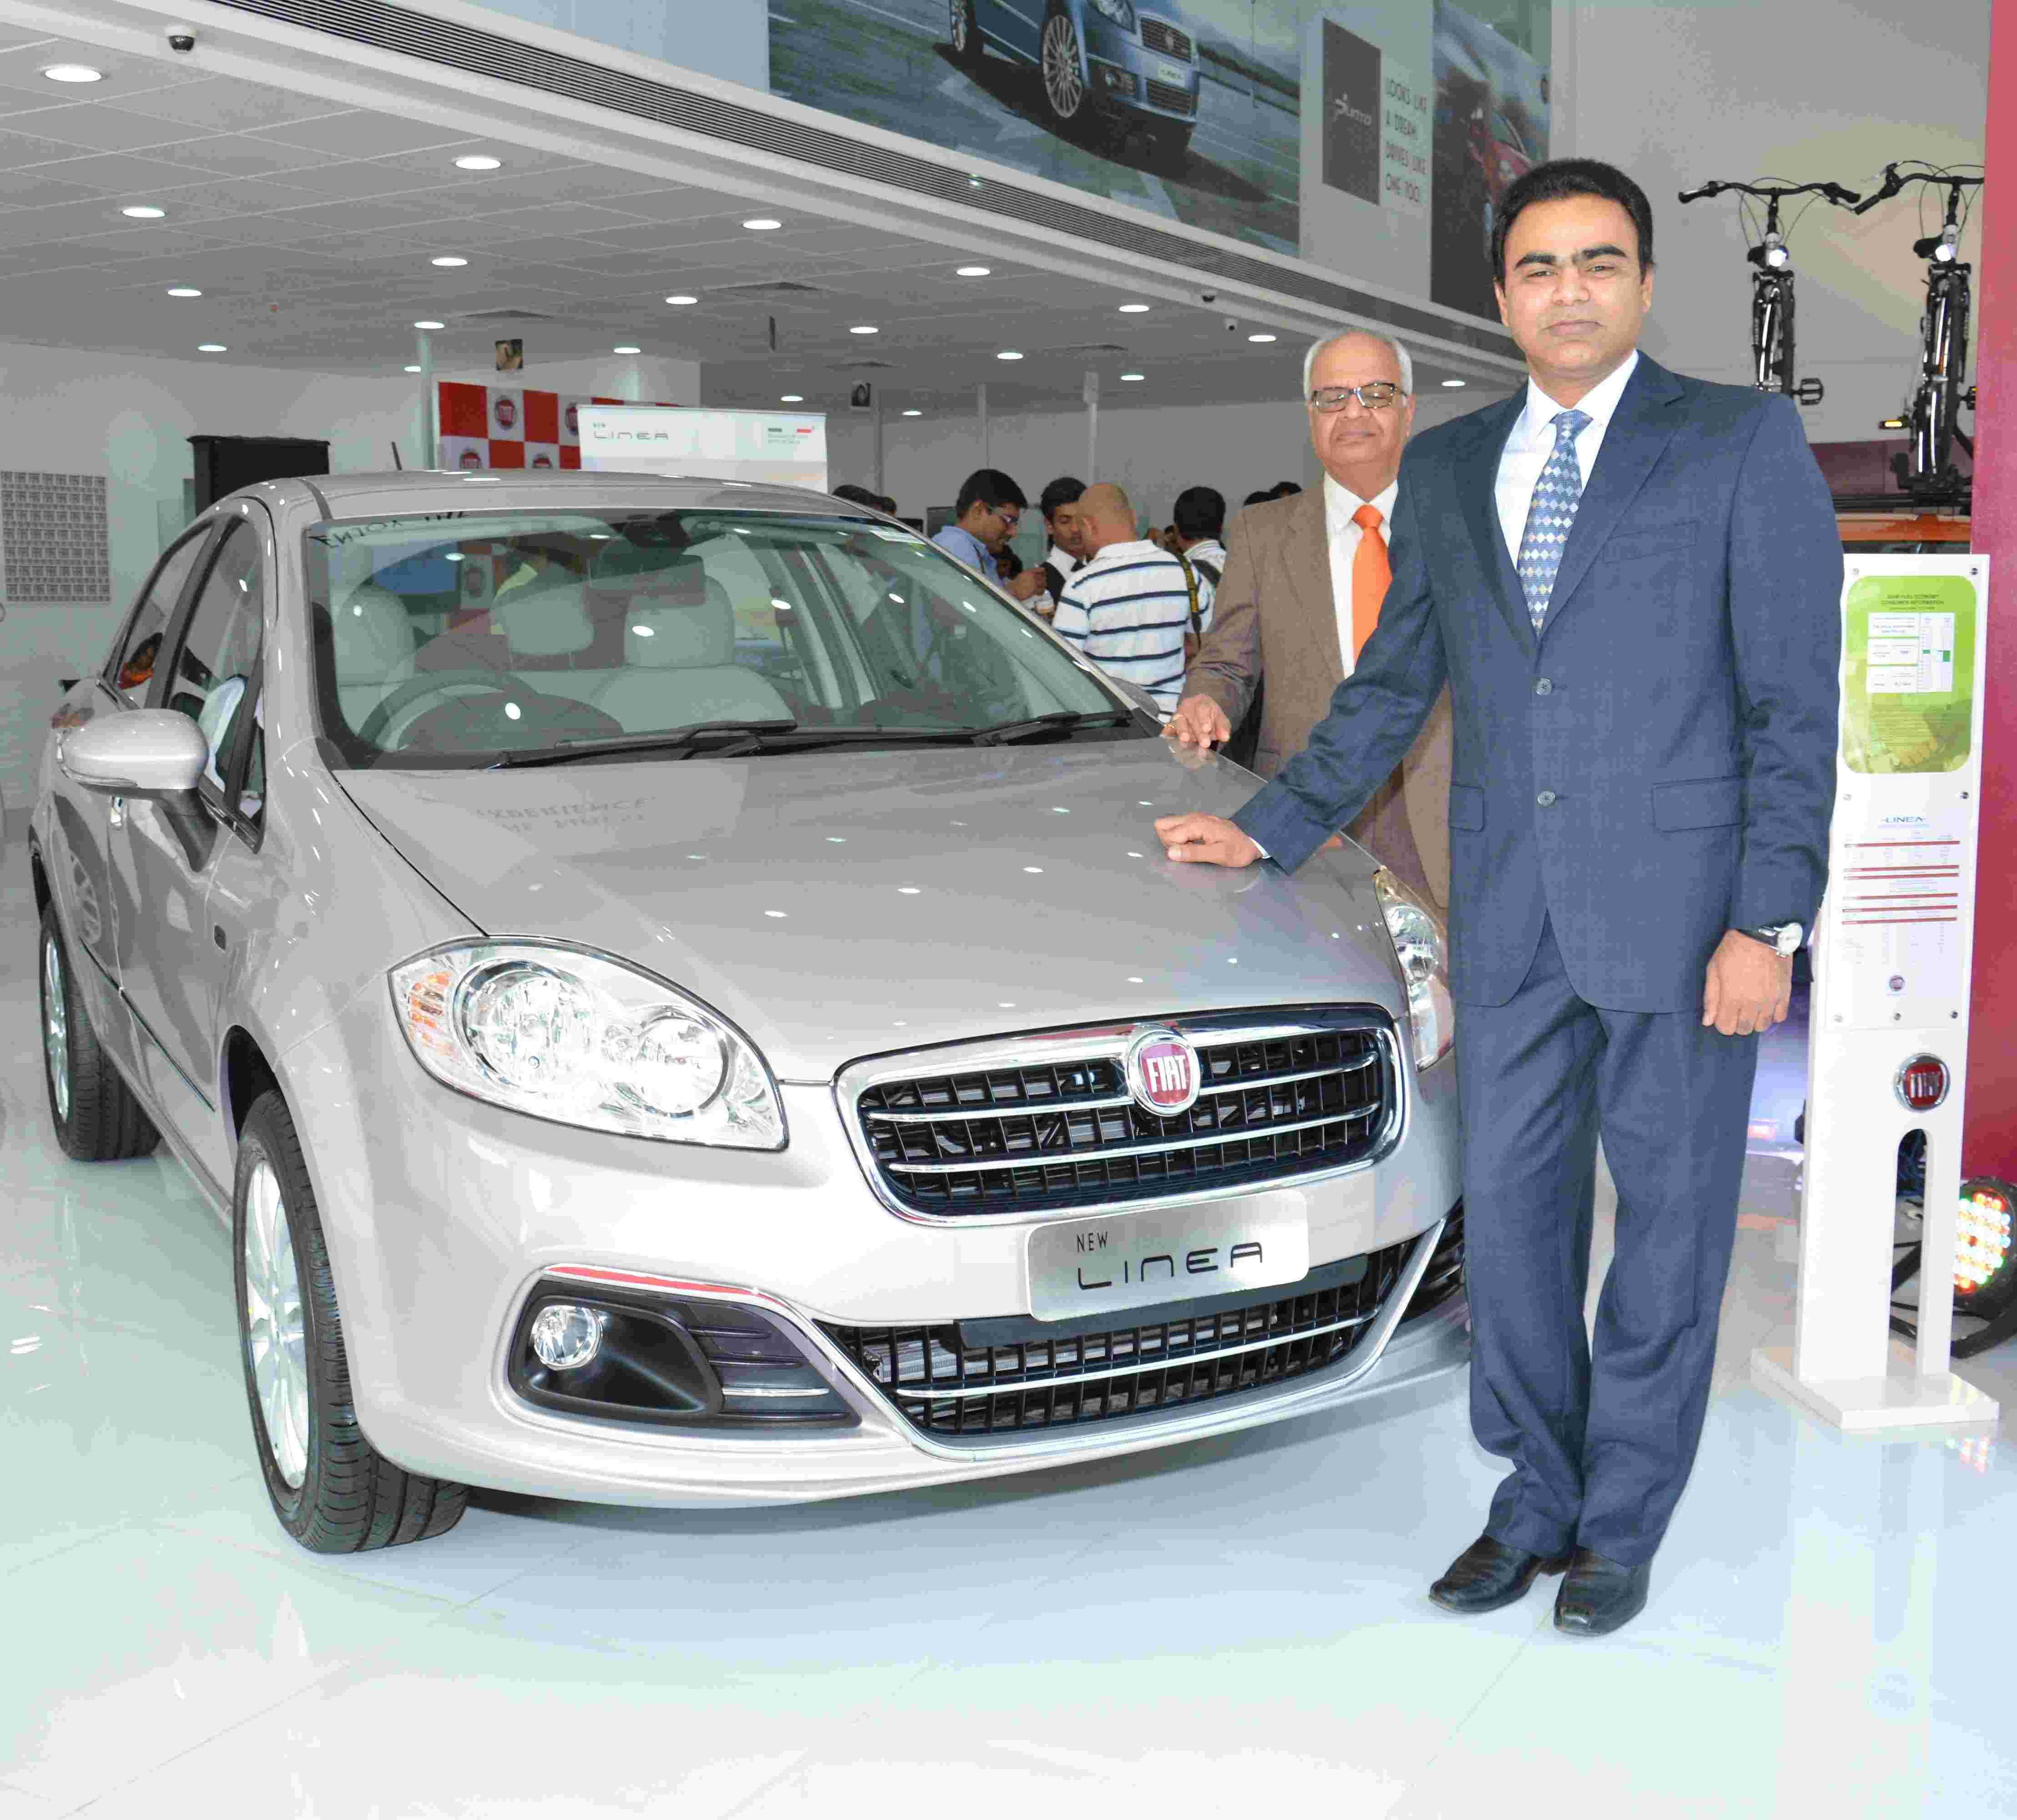 fiat automobiles en wikiwand premierpadminitaxi india premier davidwilmot limited company